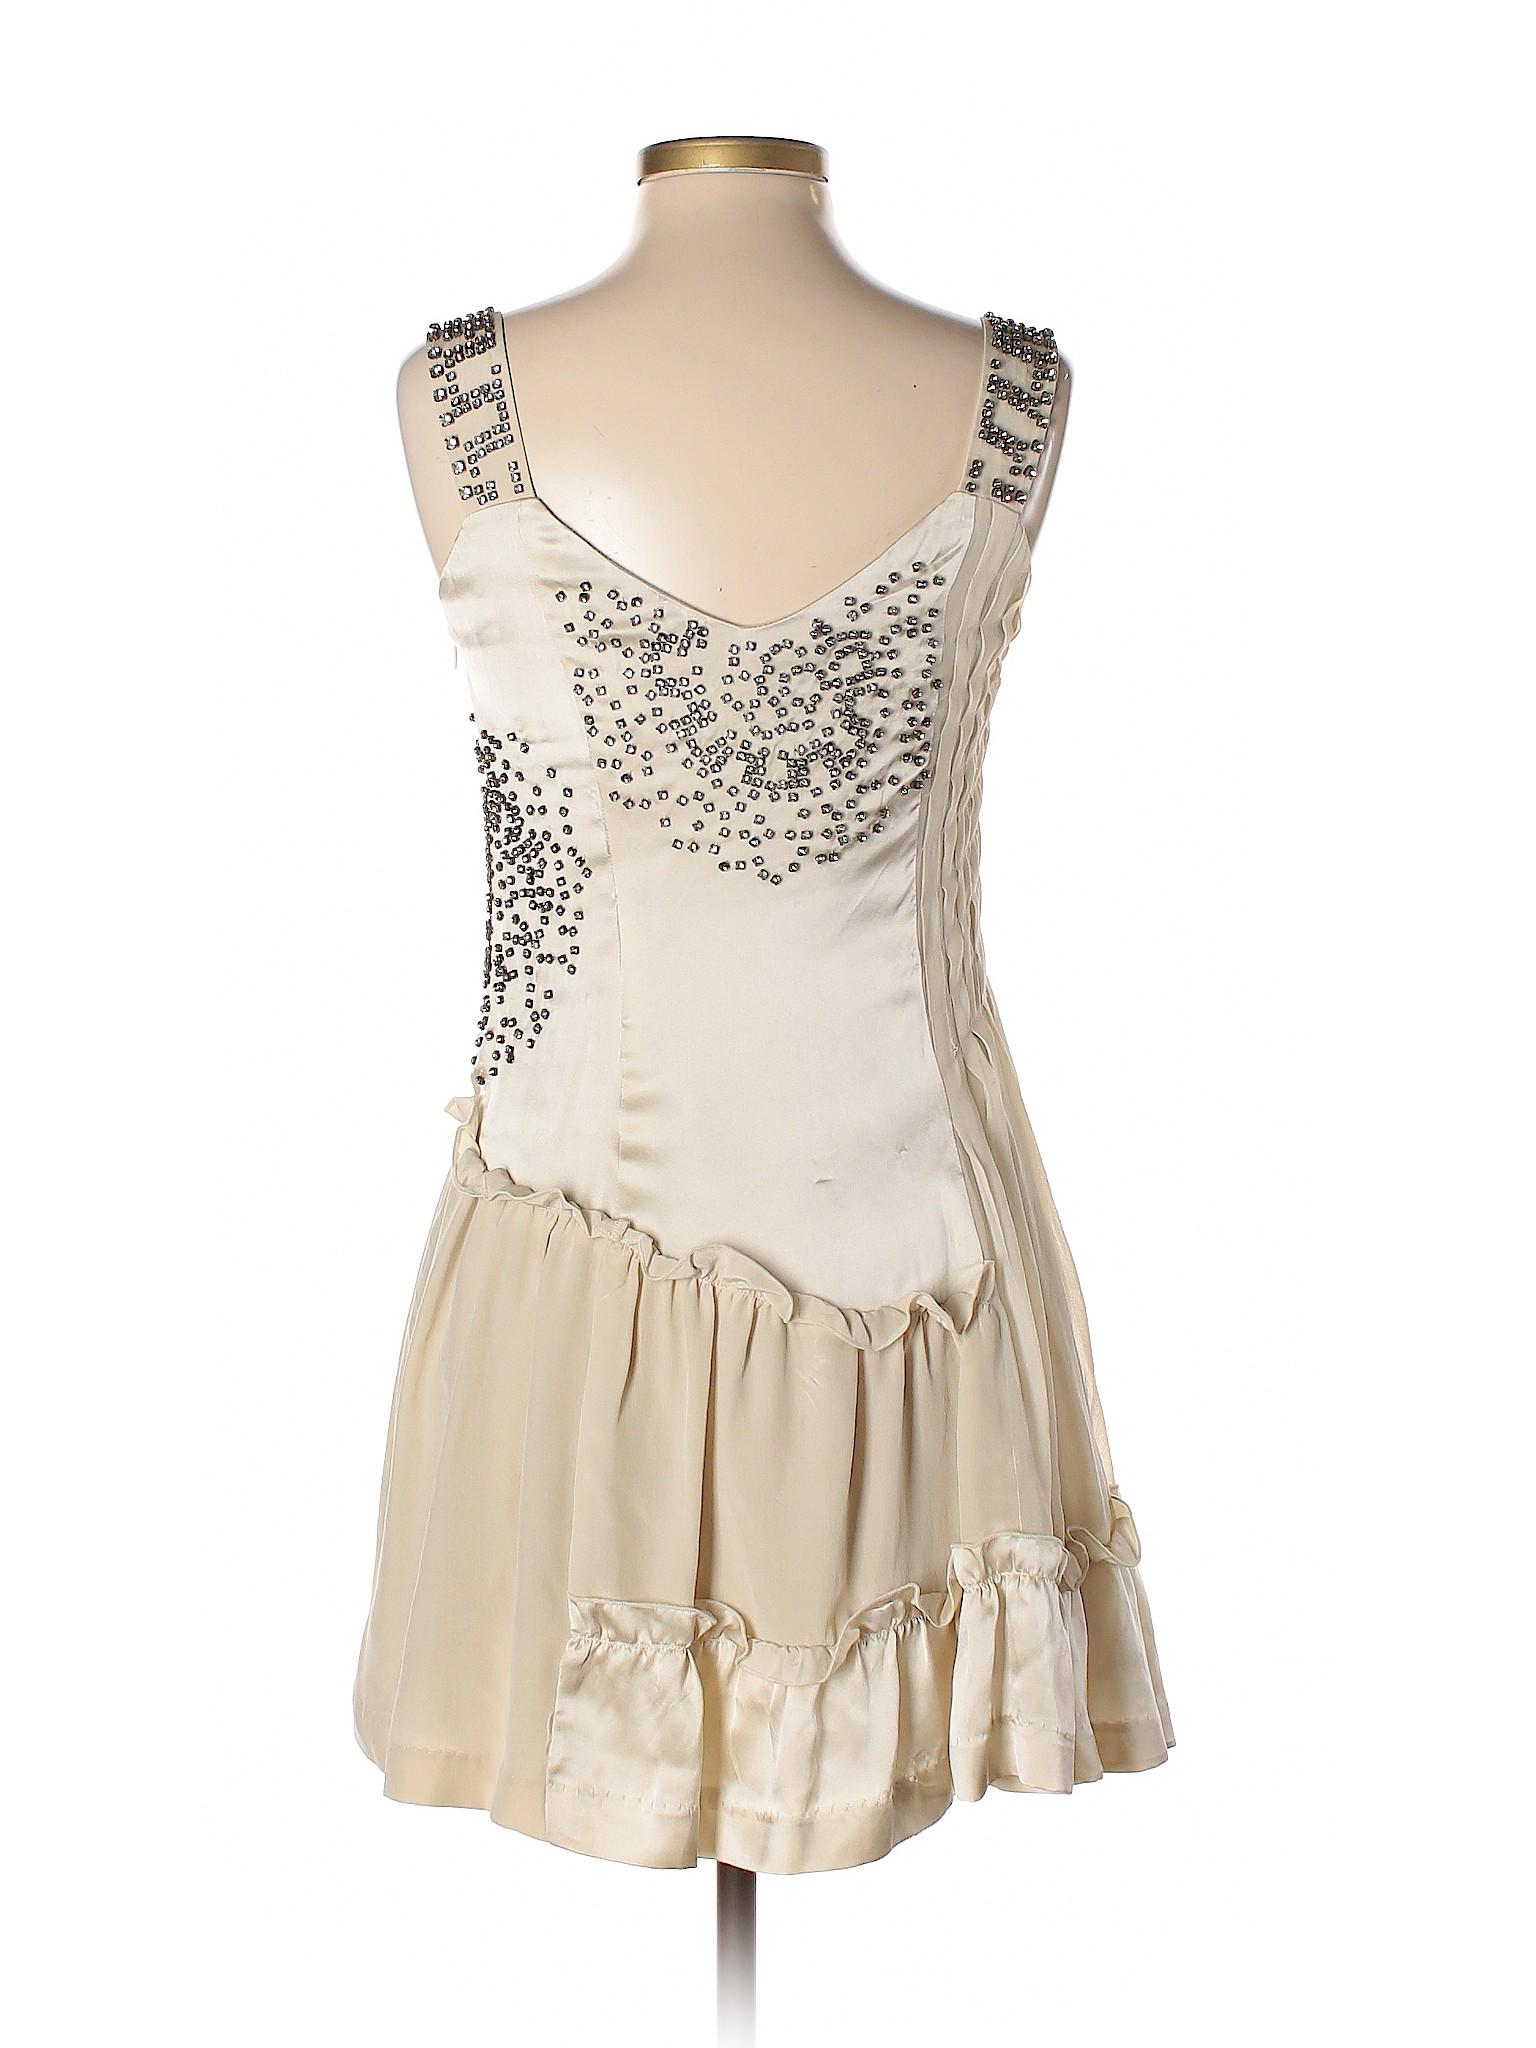 Nanette Lepore Nanette Casual Casual Nanette Dress Lepore Selling Dress Casual Selling Lepore Selling vpHxnaRW